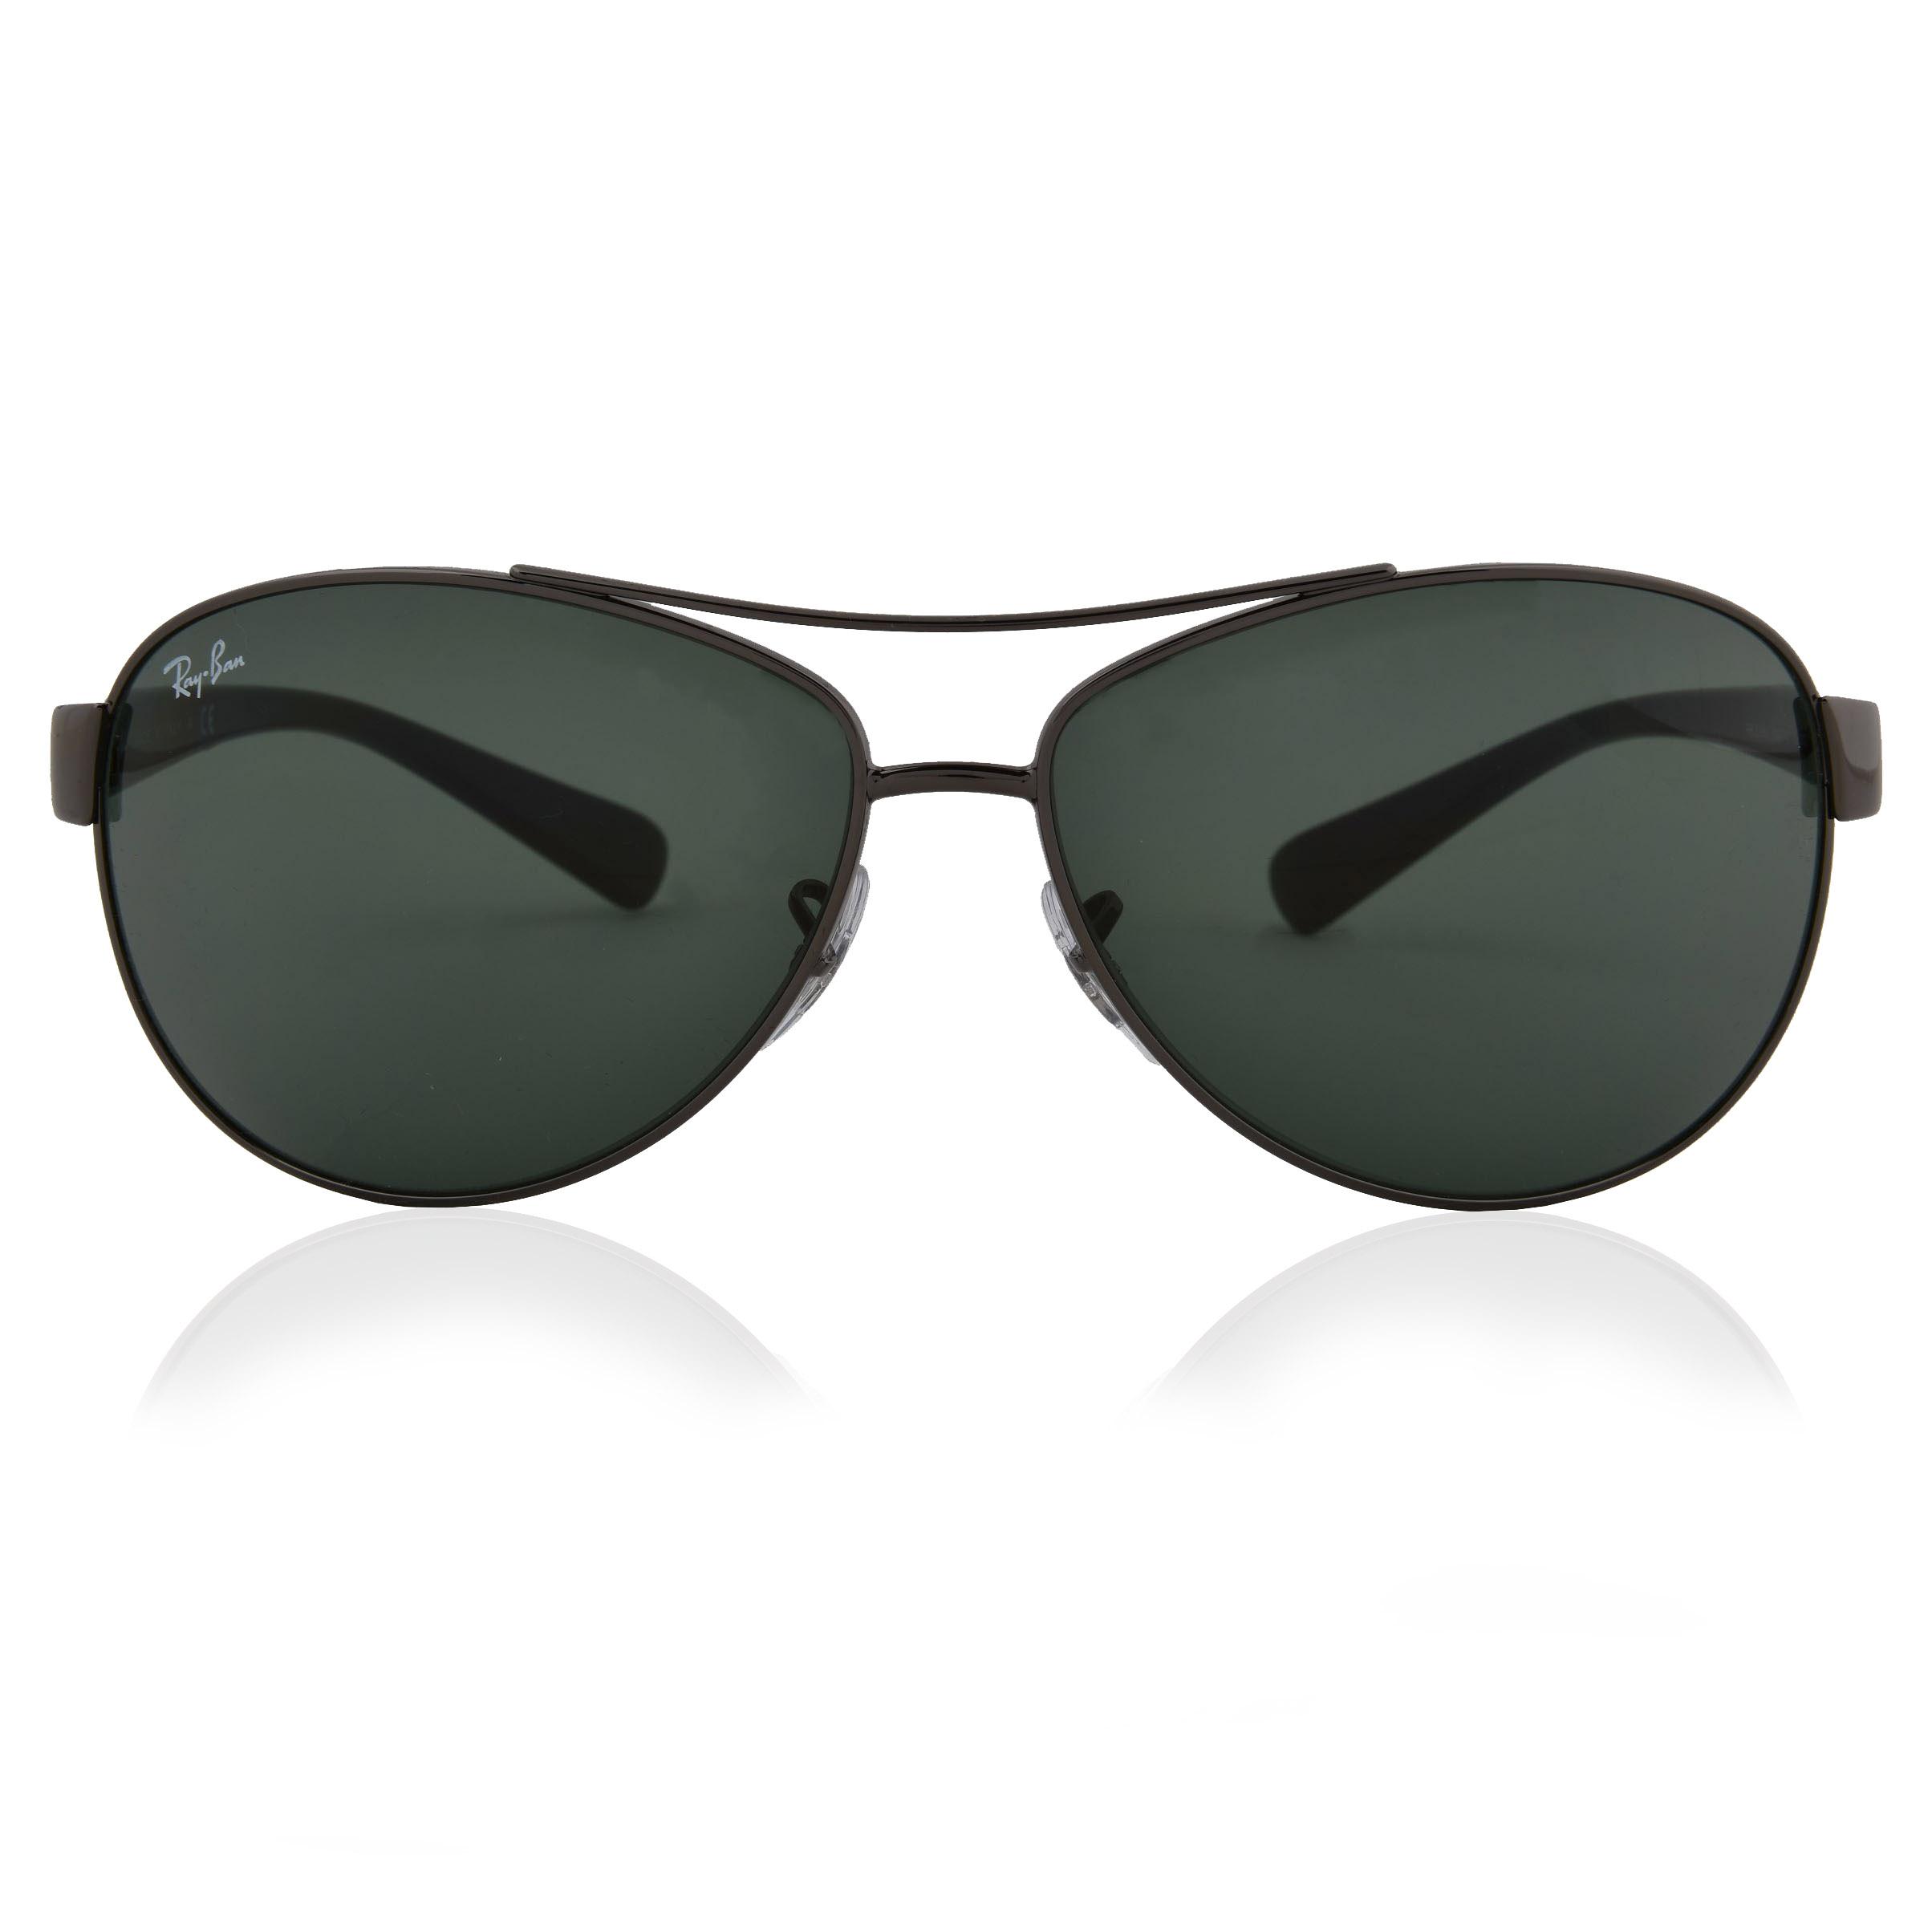 788d6bd4db0 Ray-Ban RB3386 Aviator Sunglasses For Men